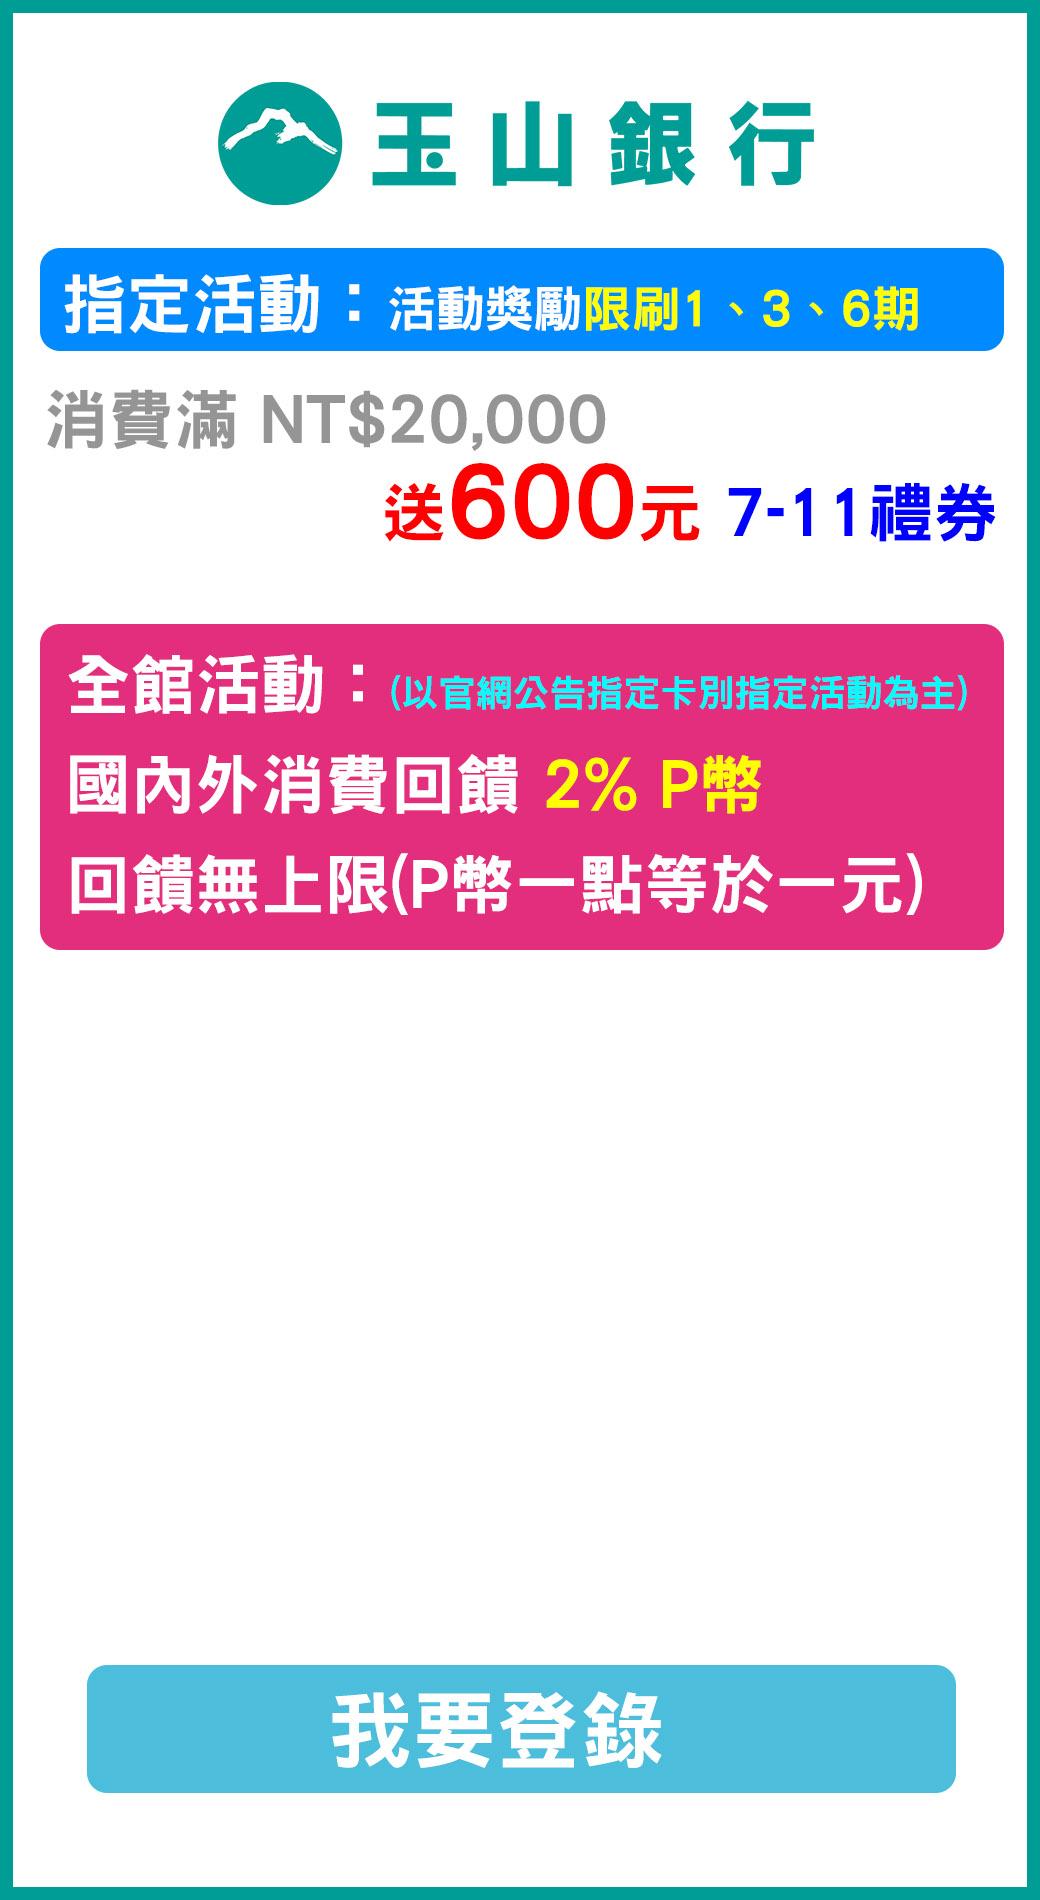 http://forum.sinya.com.tw/upload/attachment/2020/5efbfcb21a9ab6846.jpg